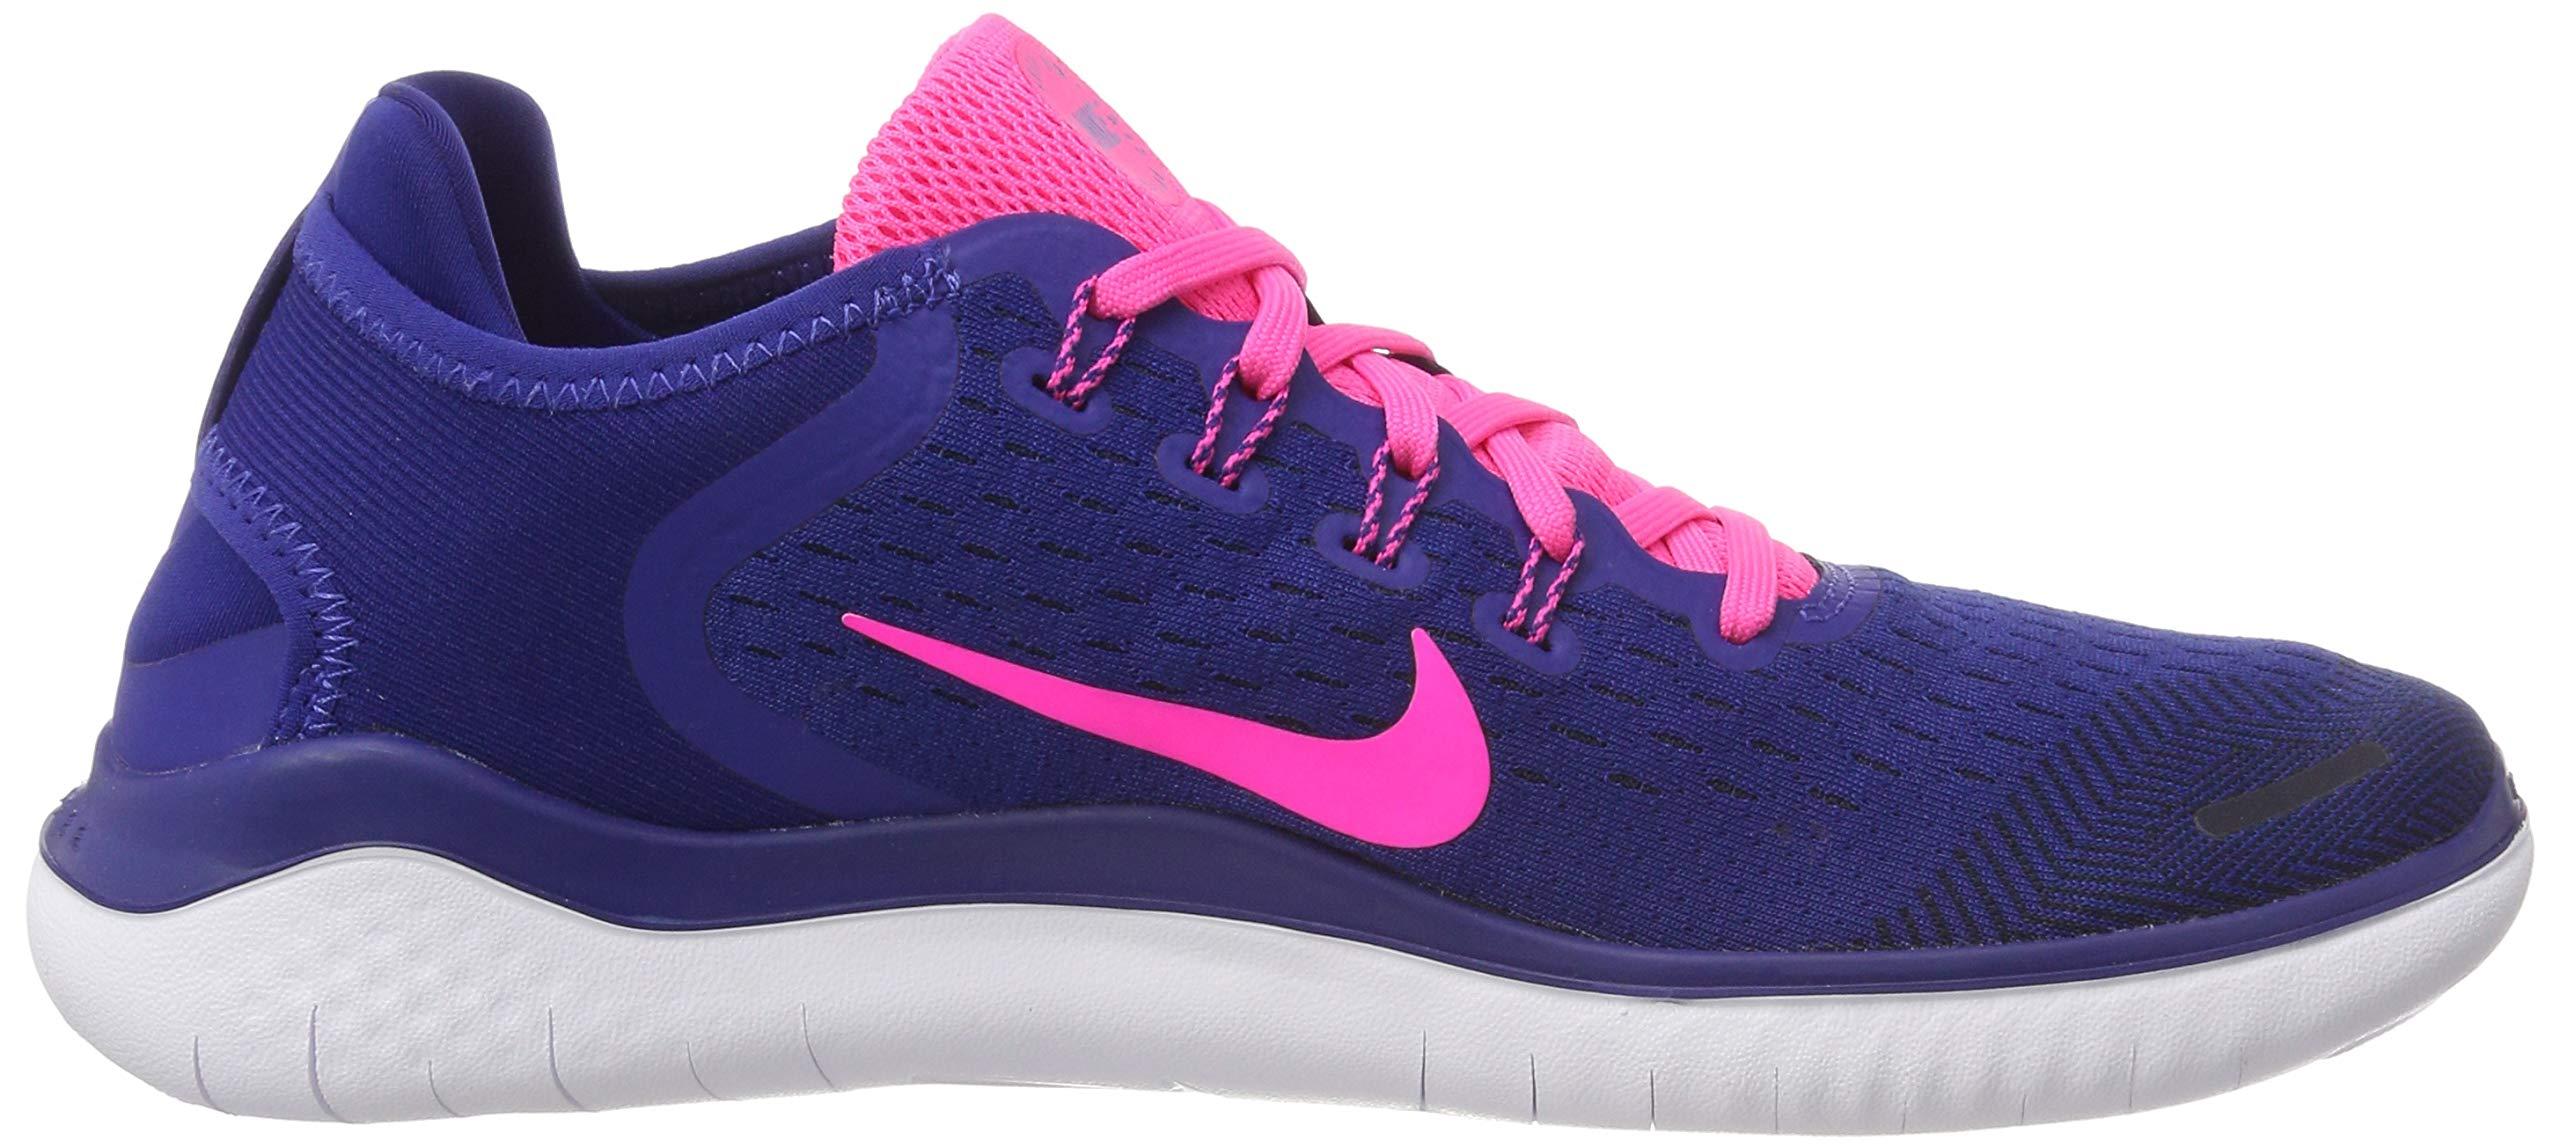 71uuKa5eGNL - Nike Women's Free 2018 Competition Running Shoes